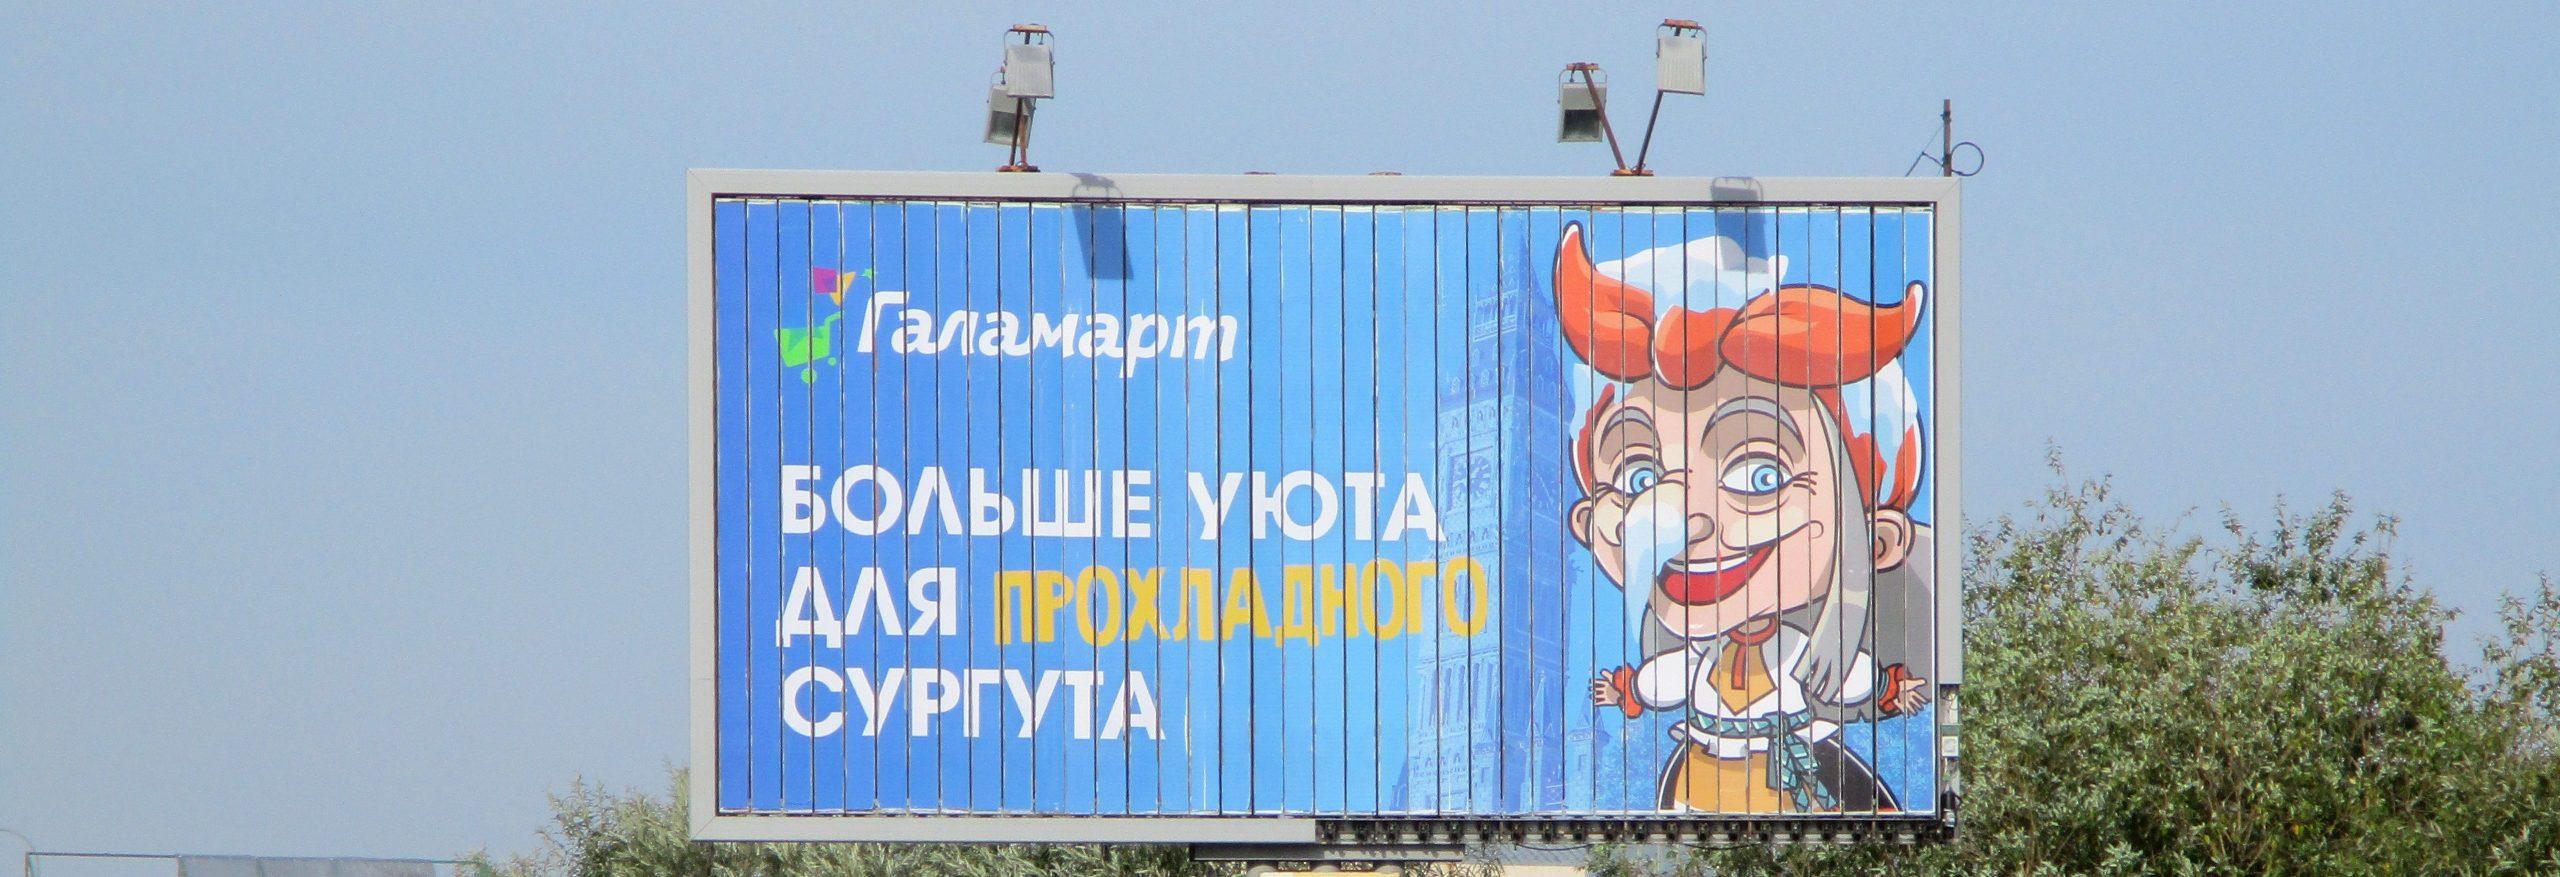 Рекламная кампания для Галамарт в ХМАО